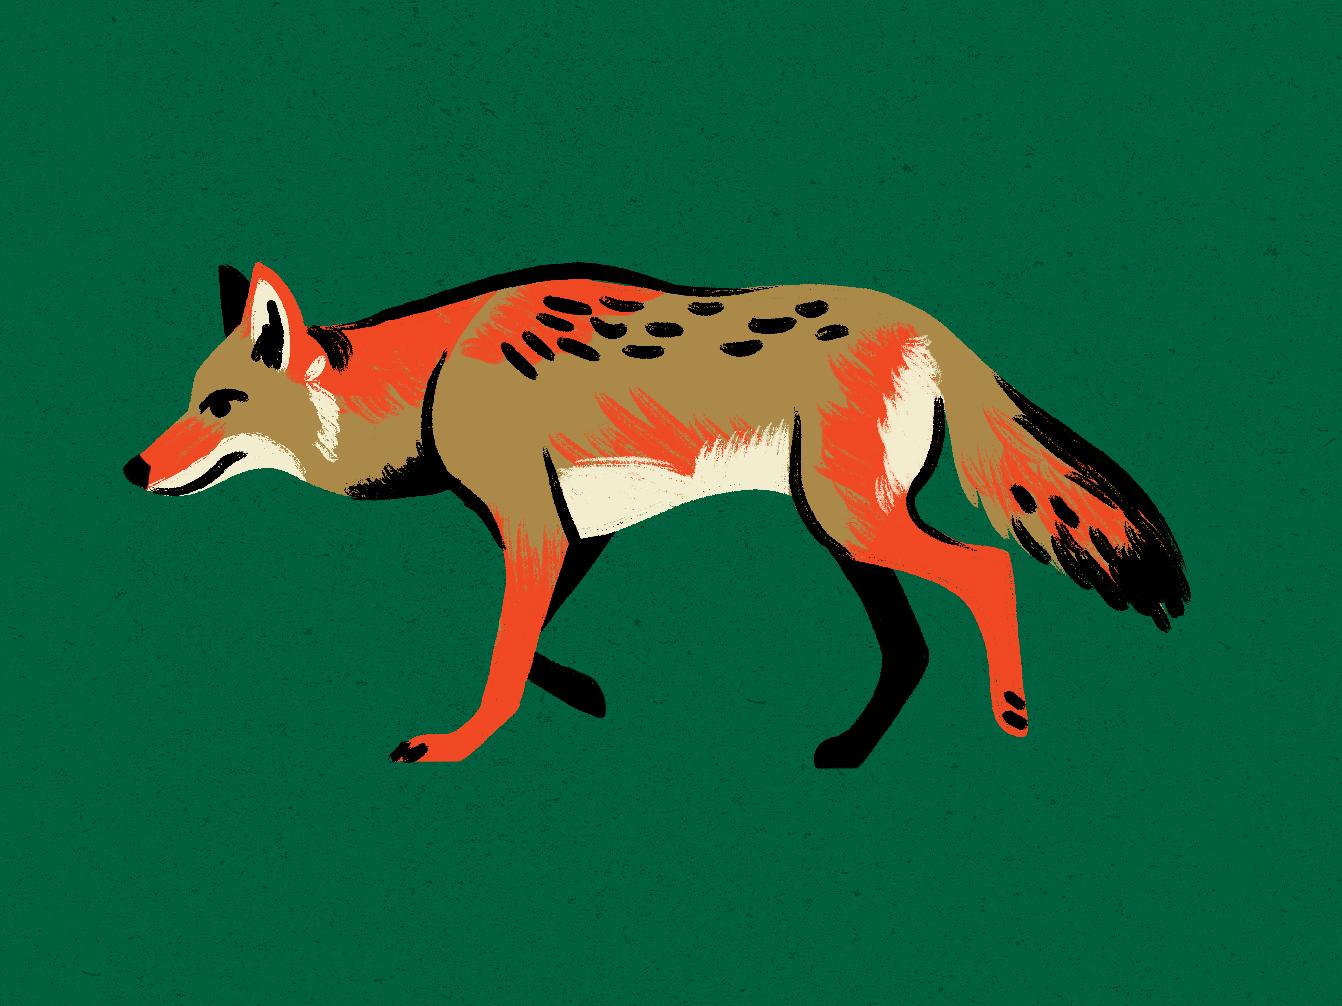 Coyote animal coyote illustration